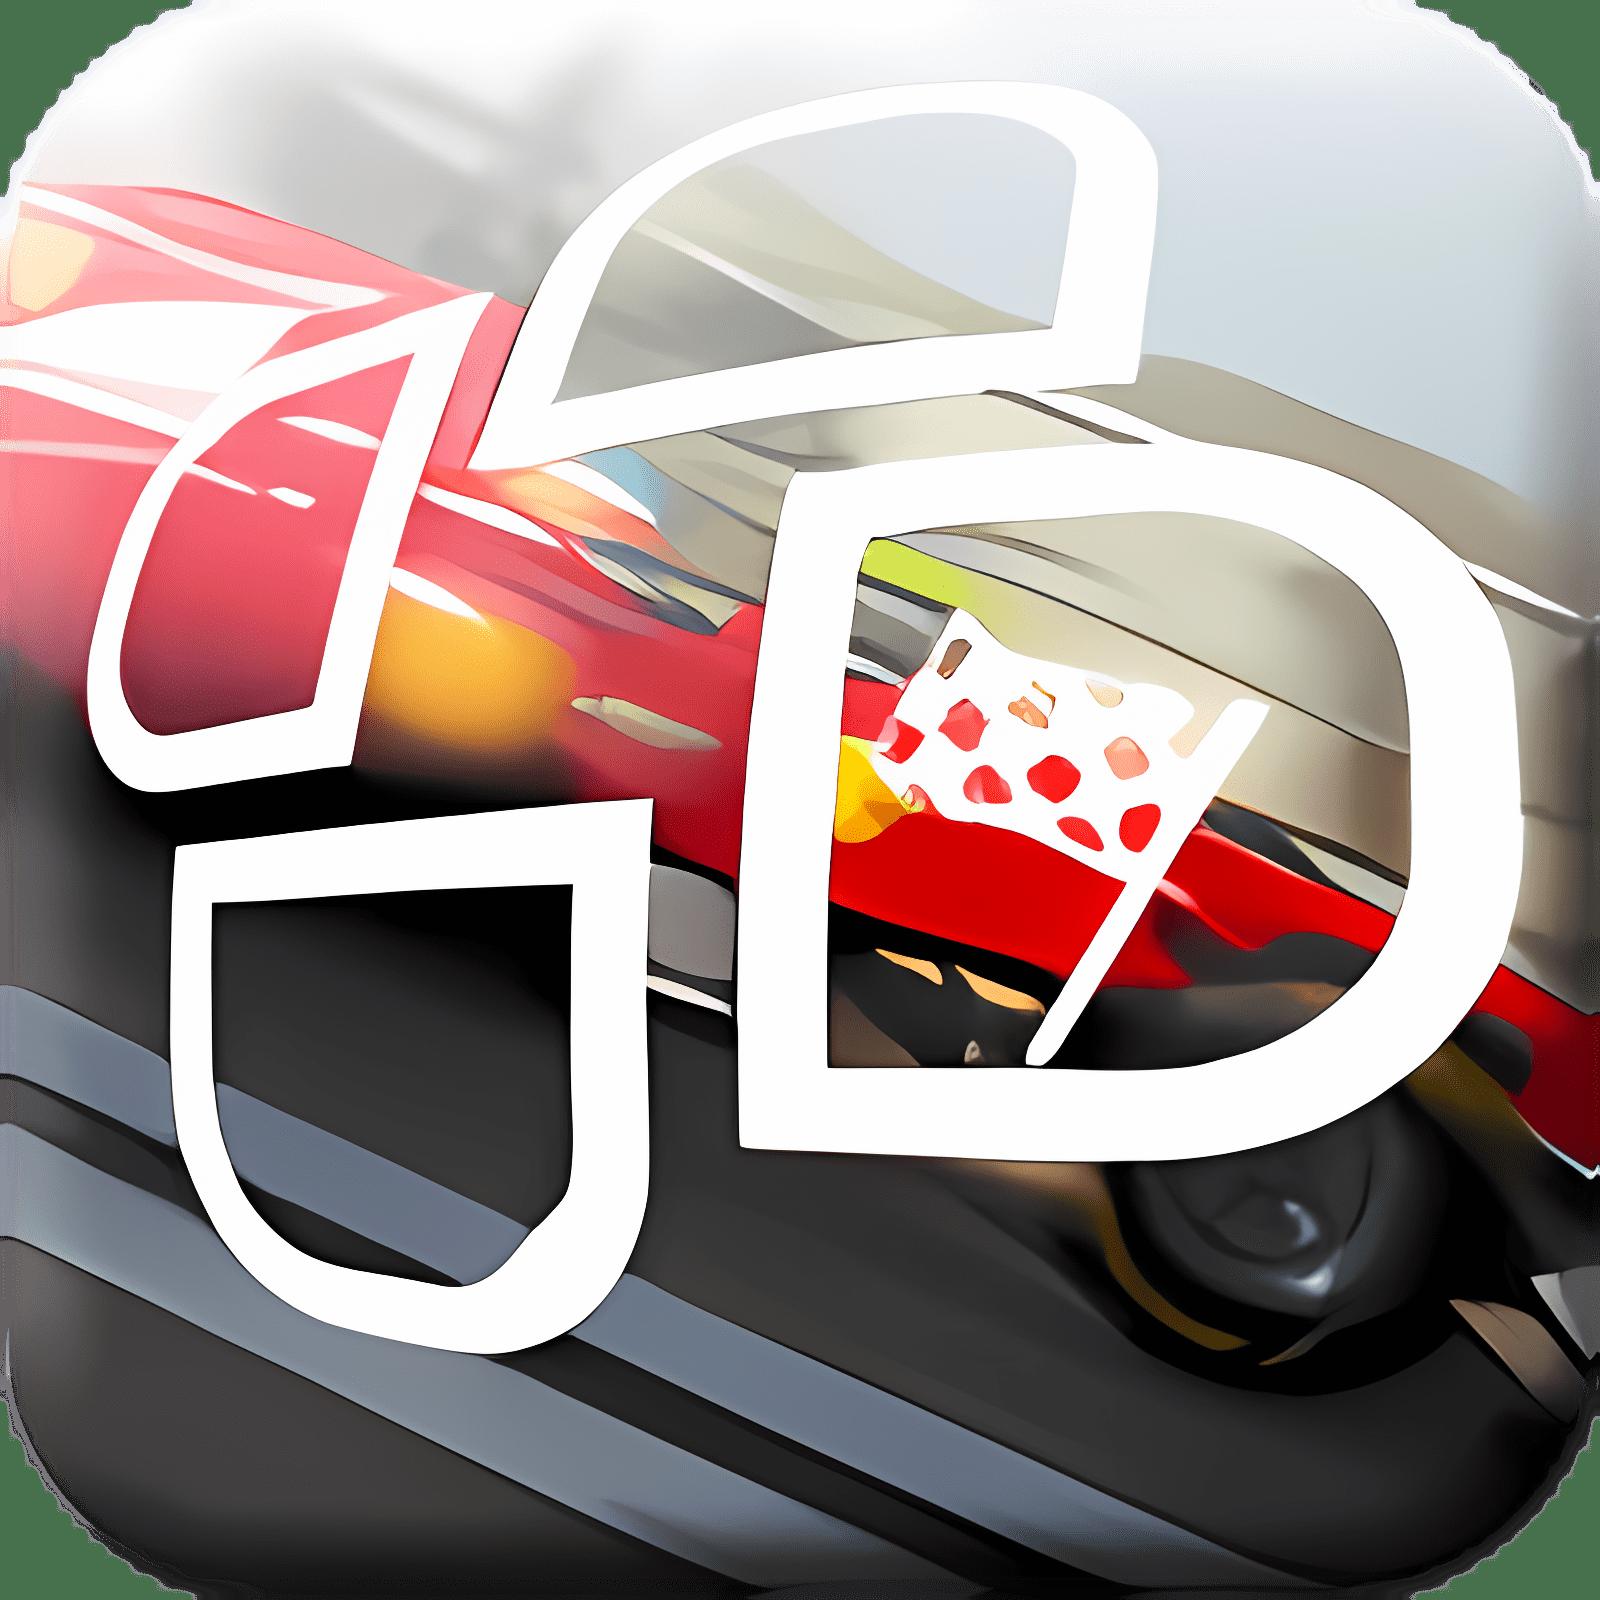 F1 2011 Live 1.0.2